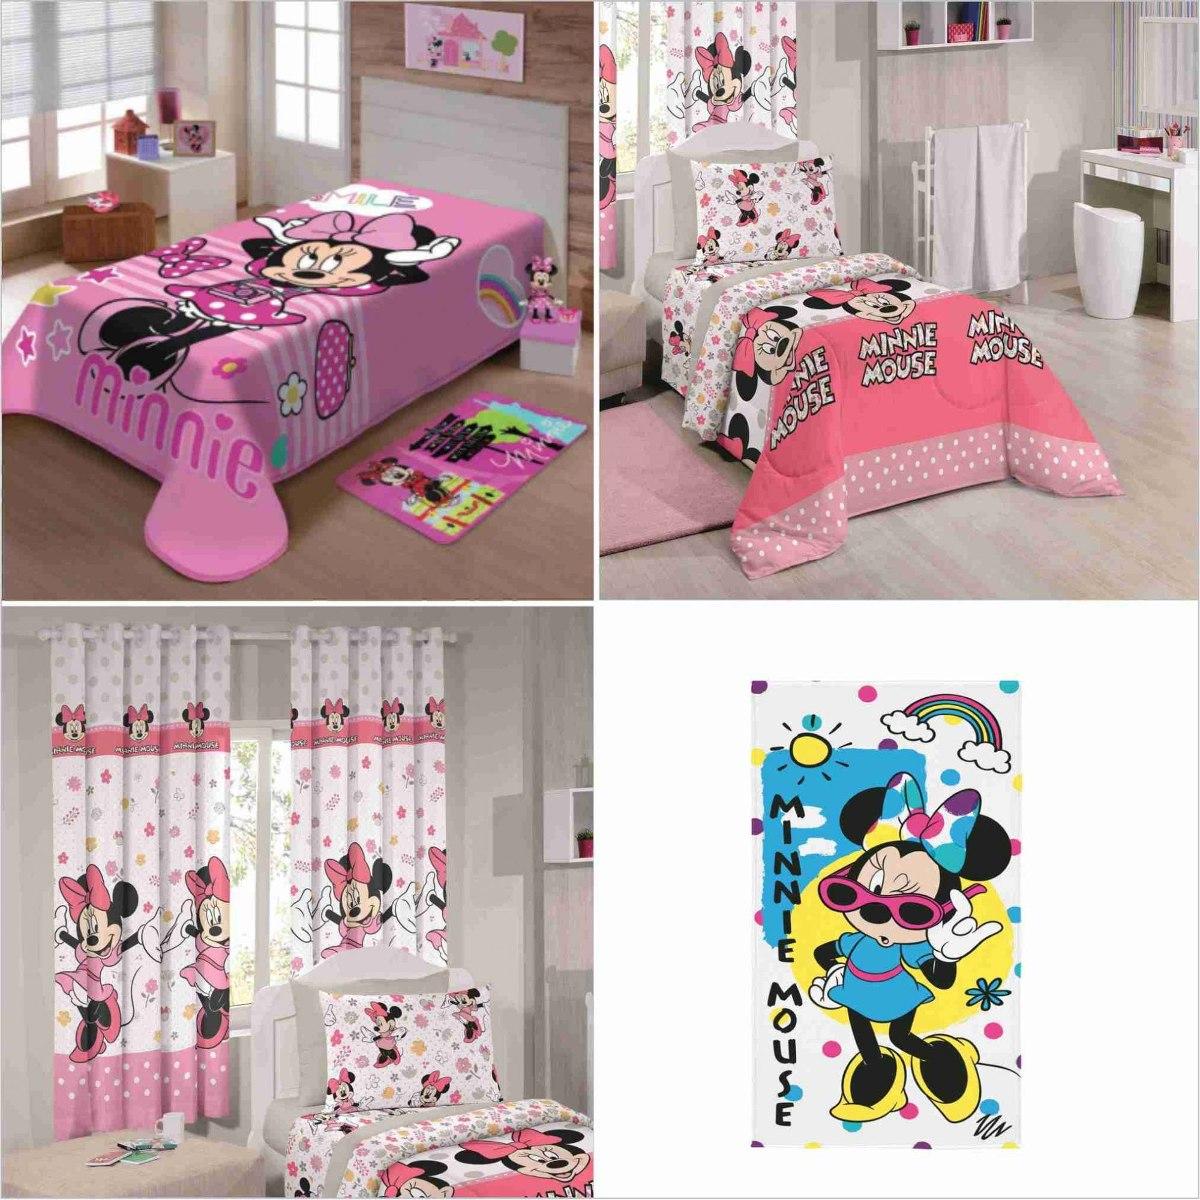 69138003b5 kit 7 pçs cobertor+jogo cama+ cortina+toalha minnie infantil. Carregando  zoom.